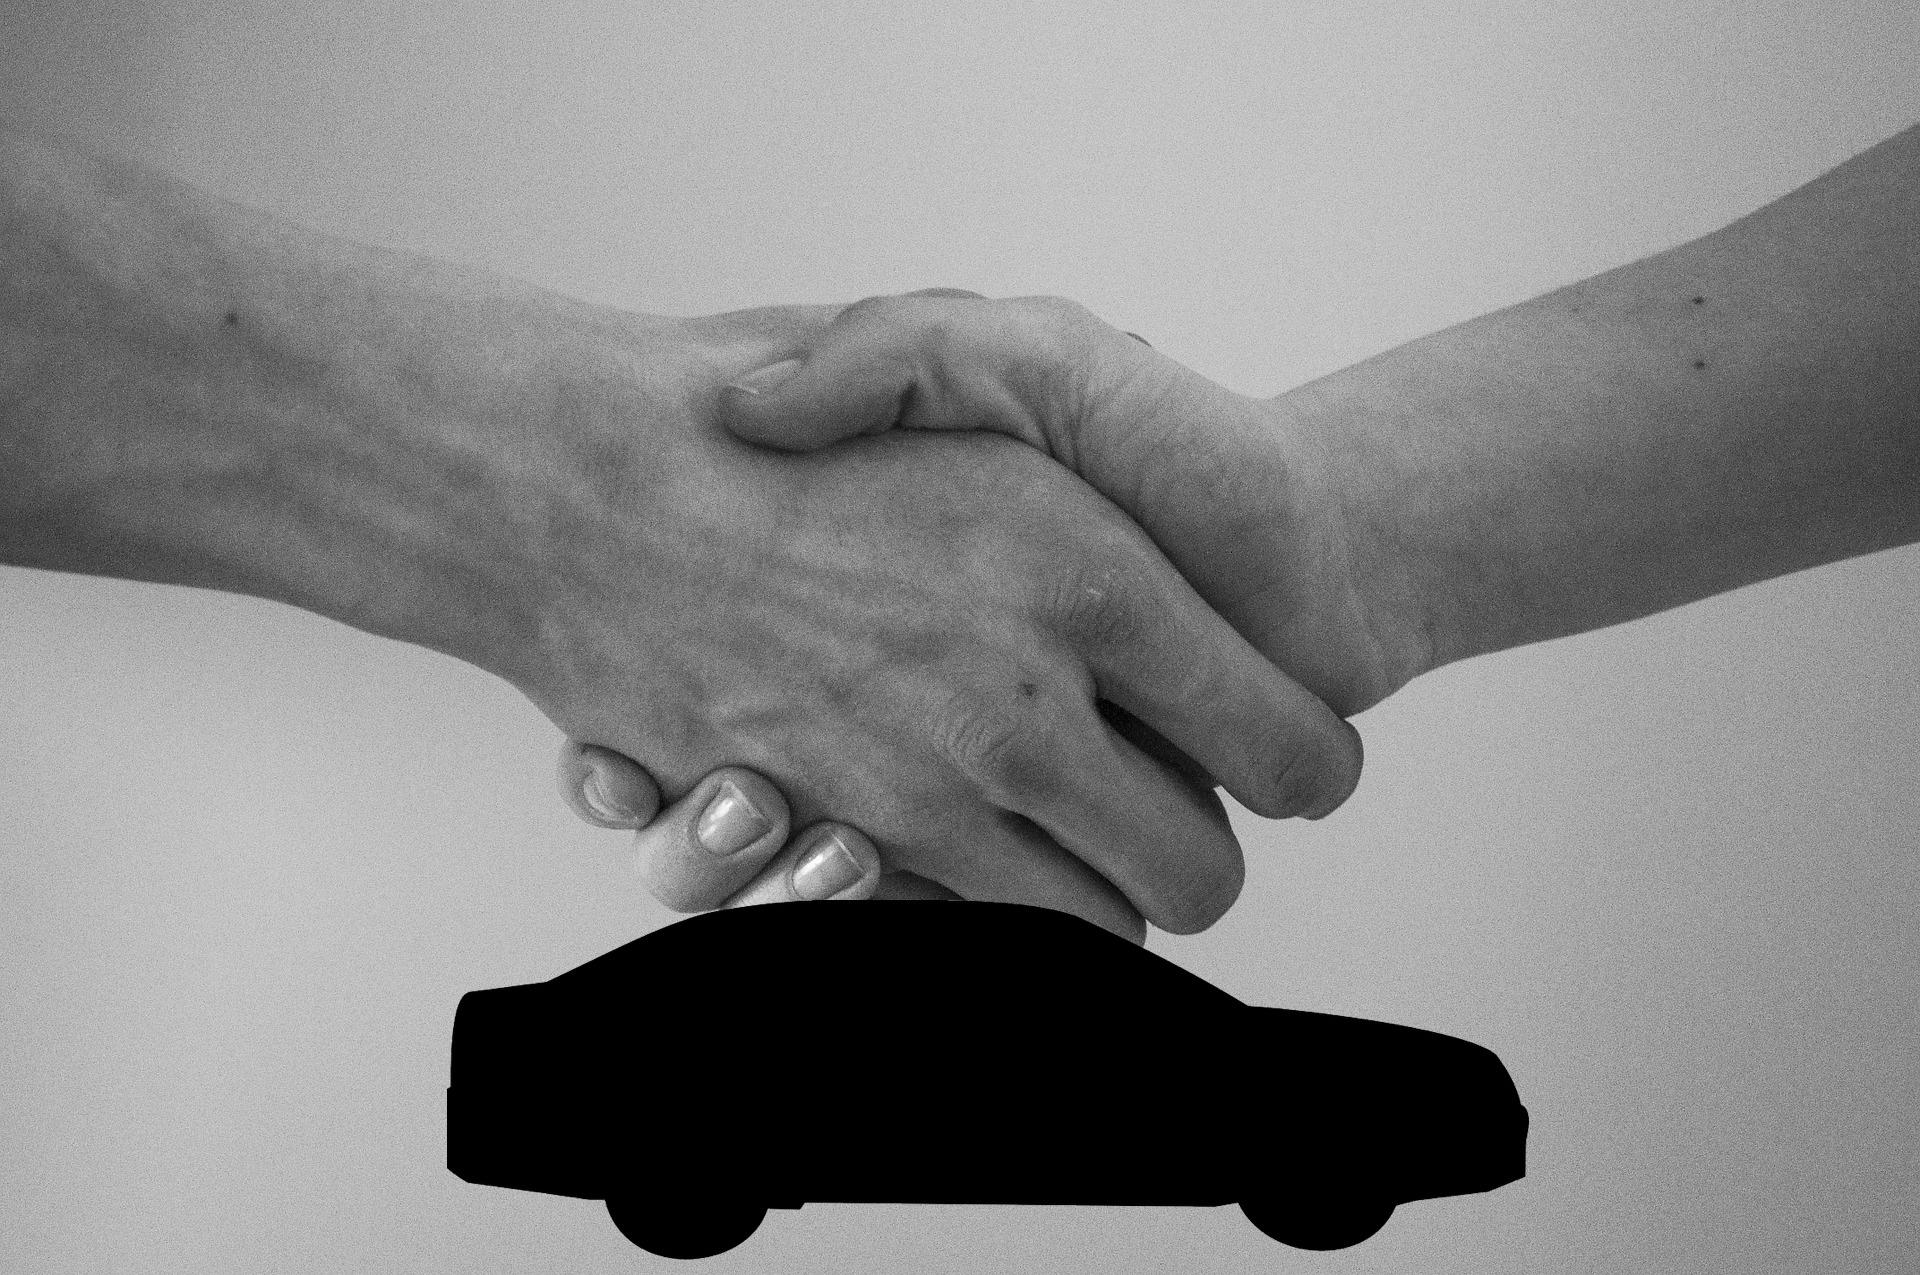 kúpna zmluva na auto